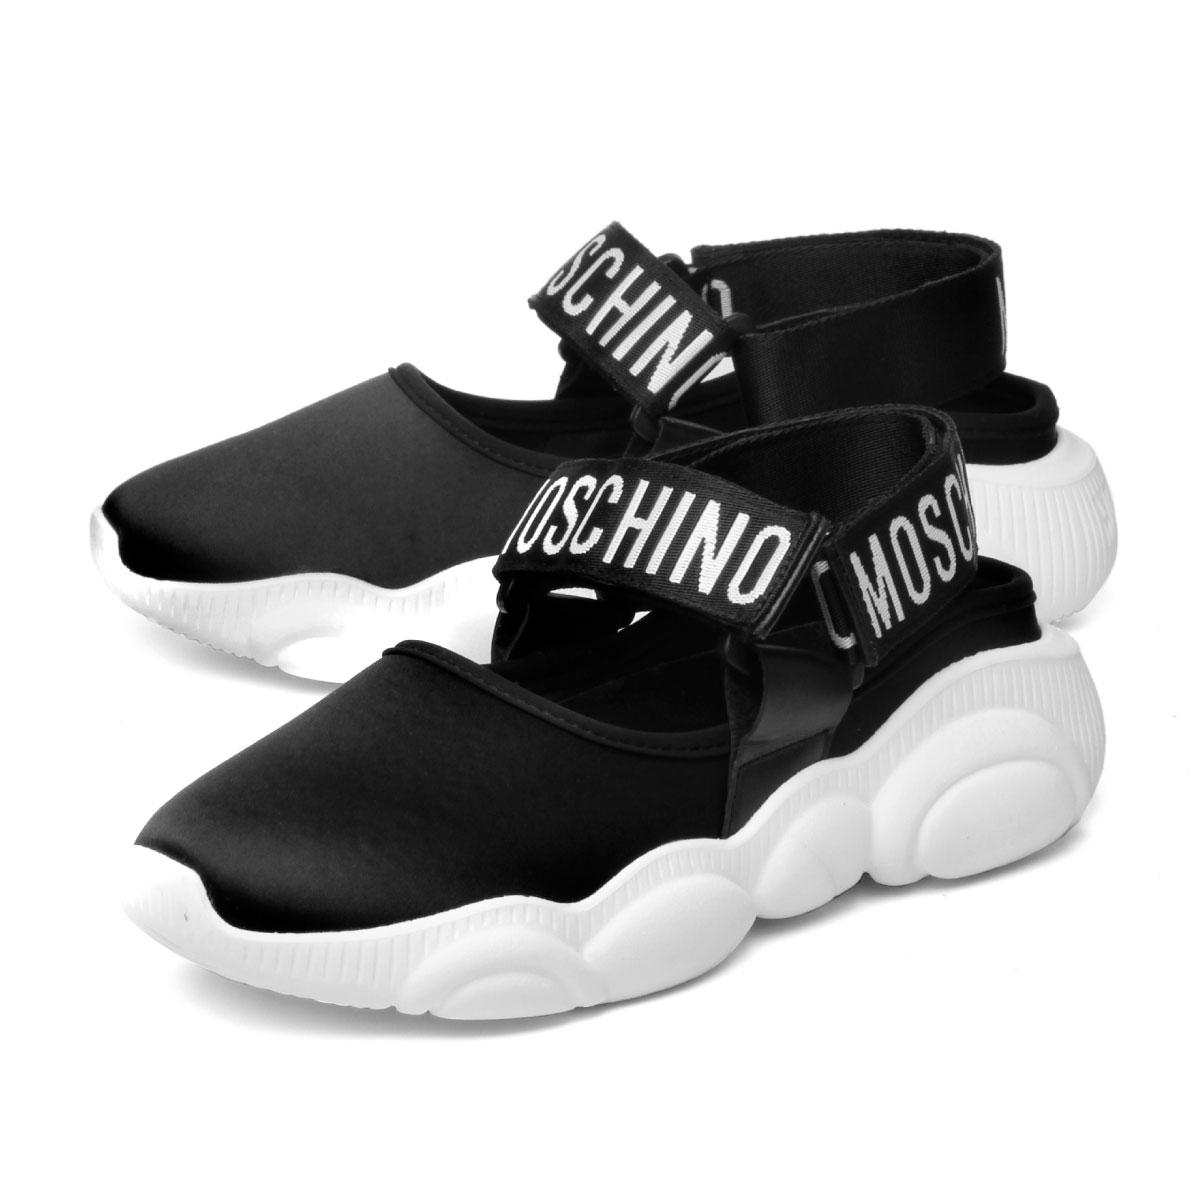 pretty nice 813af a0c5b MOSCHINO Moschino shoes Lady's MA15103G17ML0000 sneakers TEDDY RUN Teddy  orchid NERO black